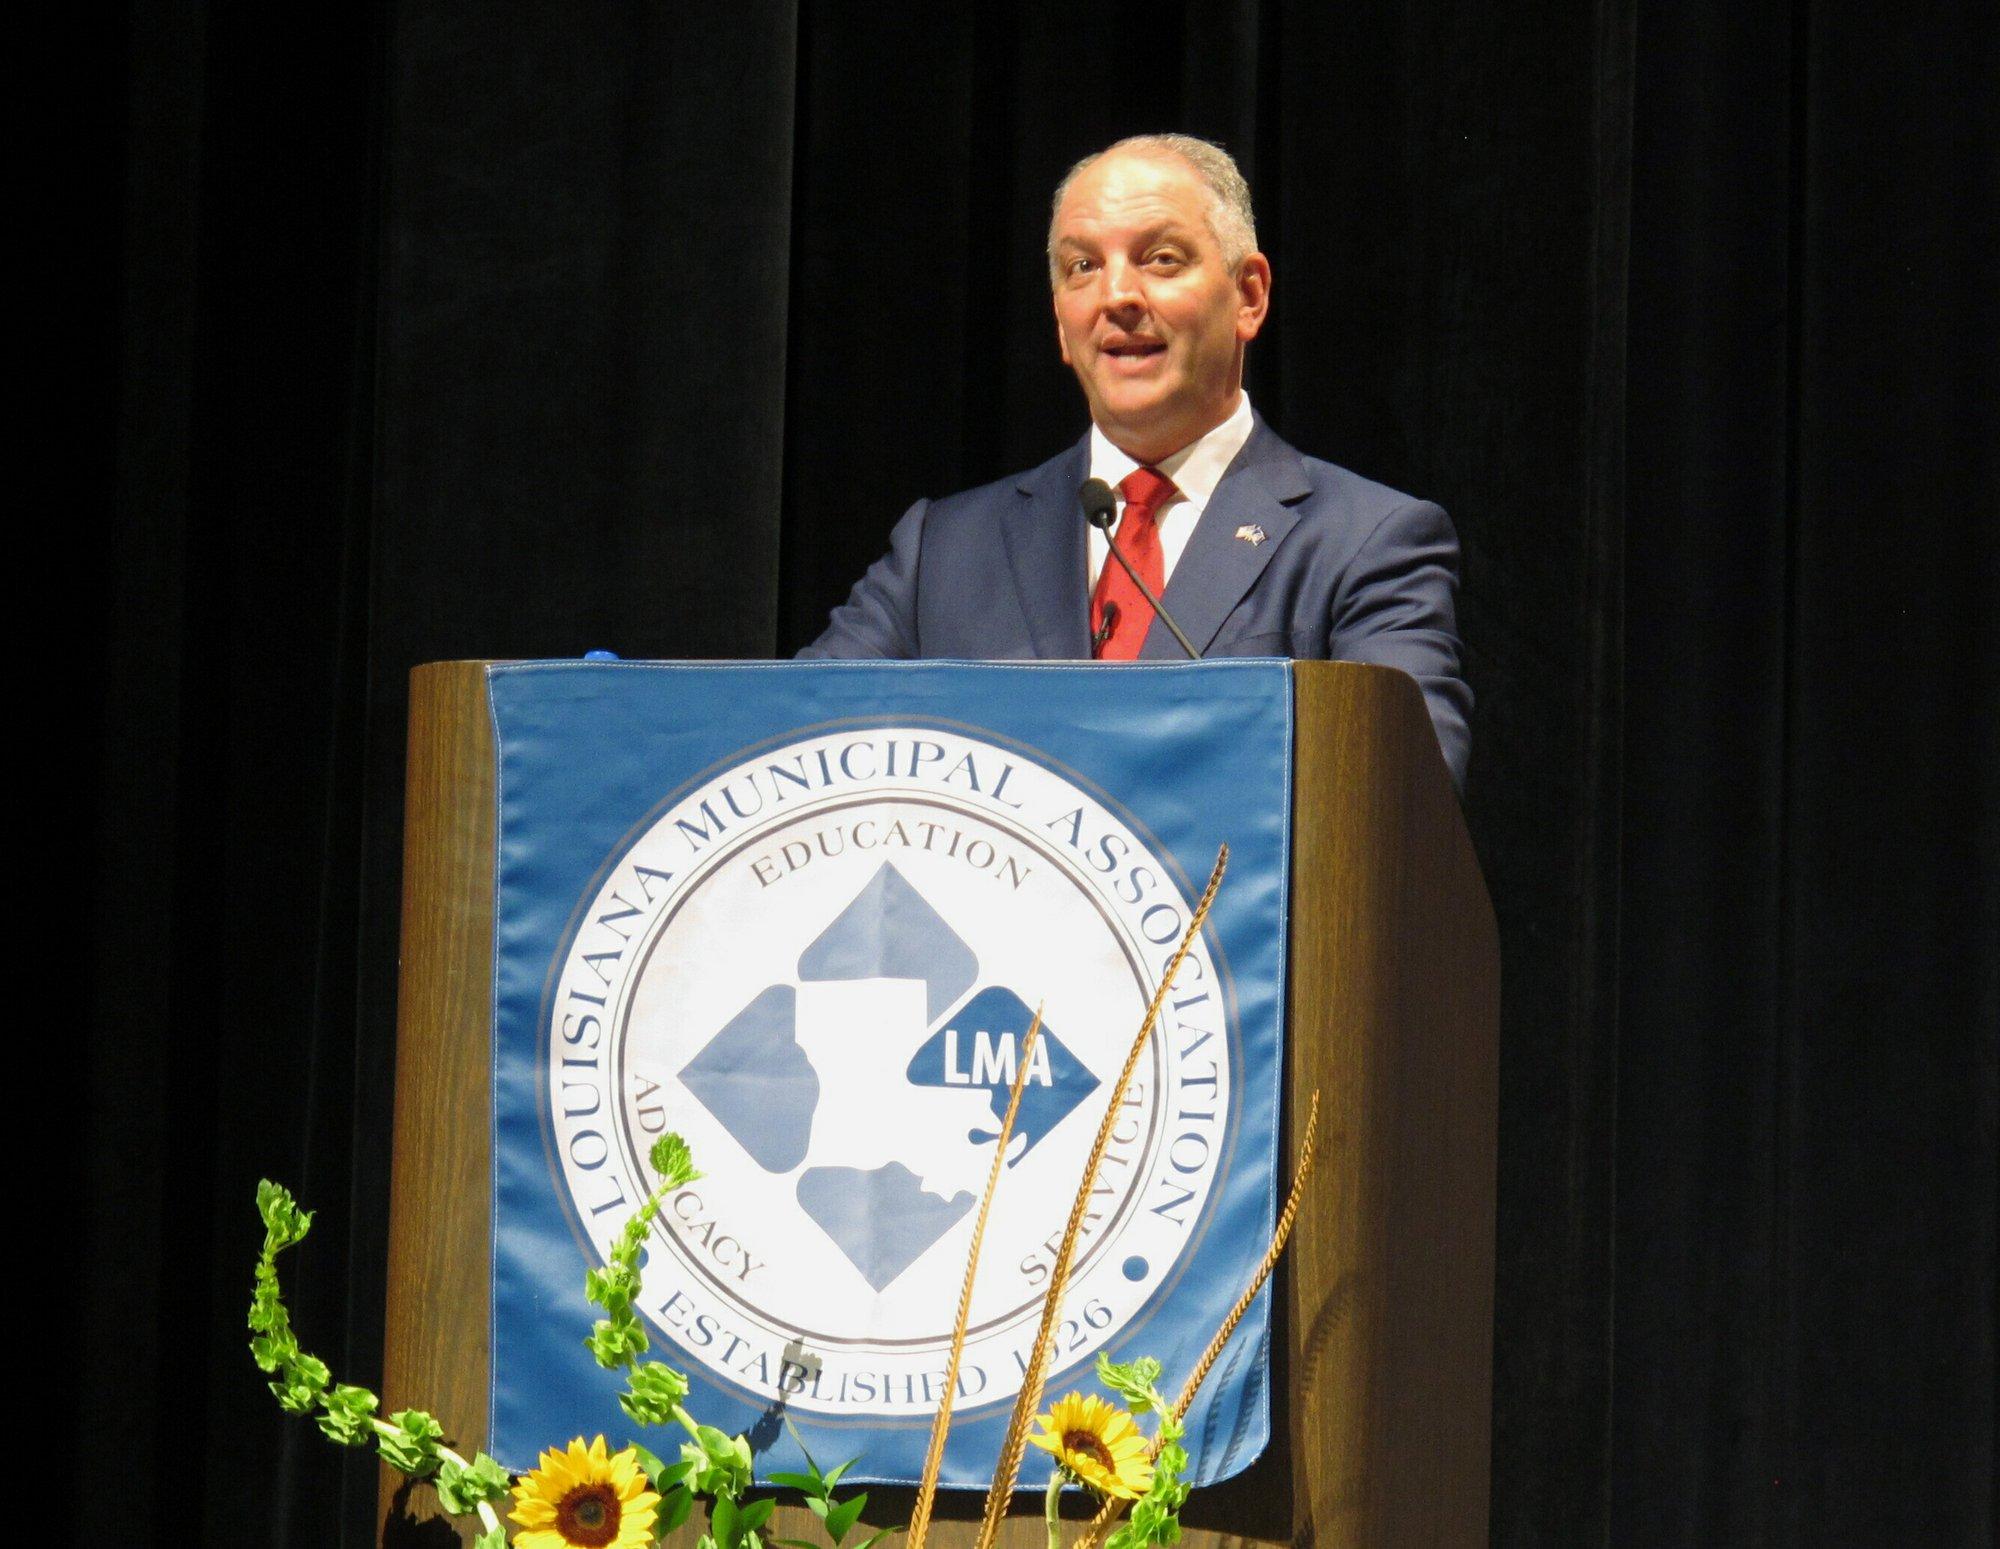 Louisiana governor candidates speak to municipal officials